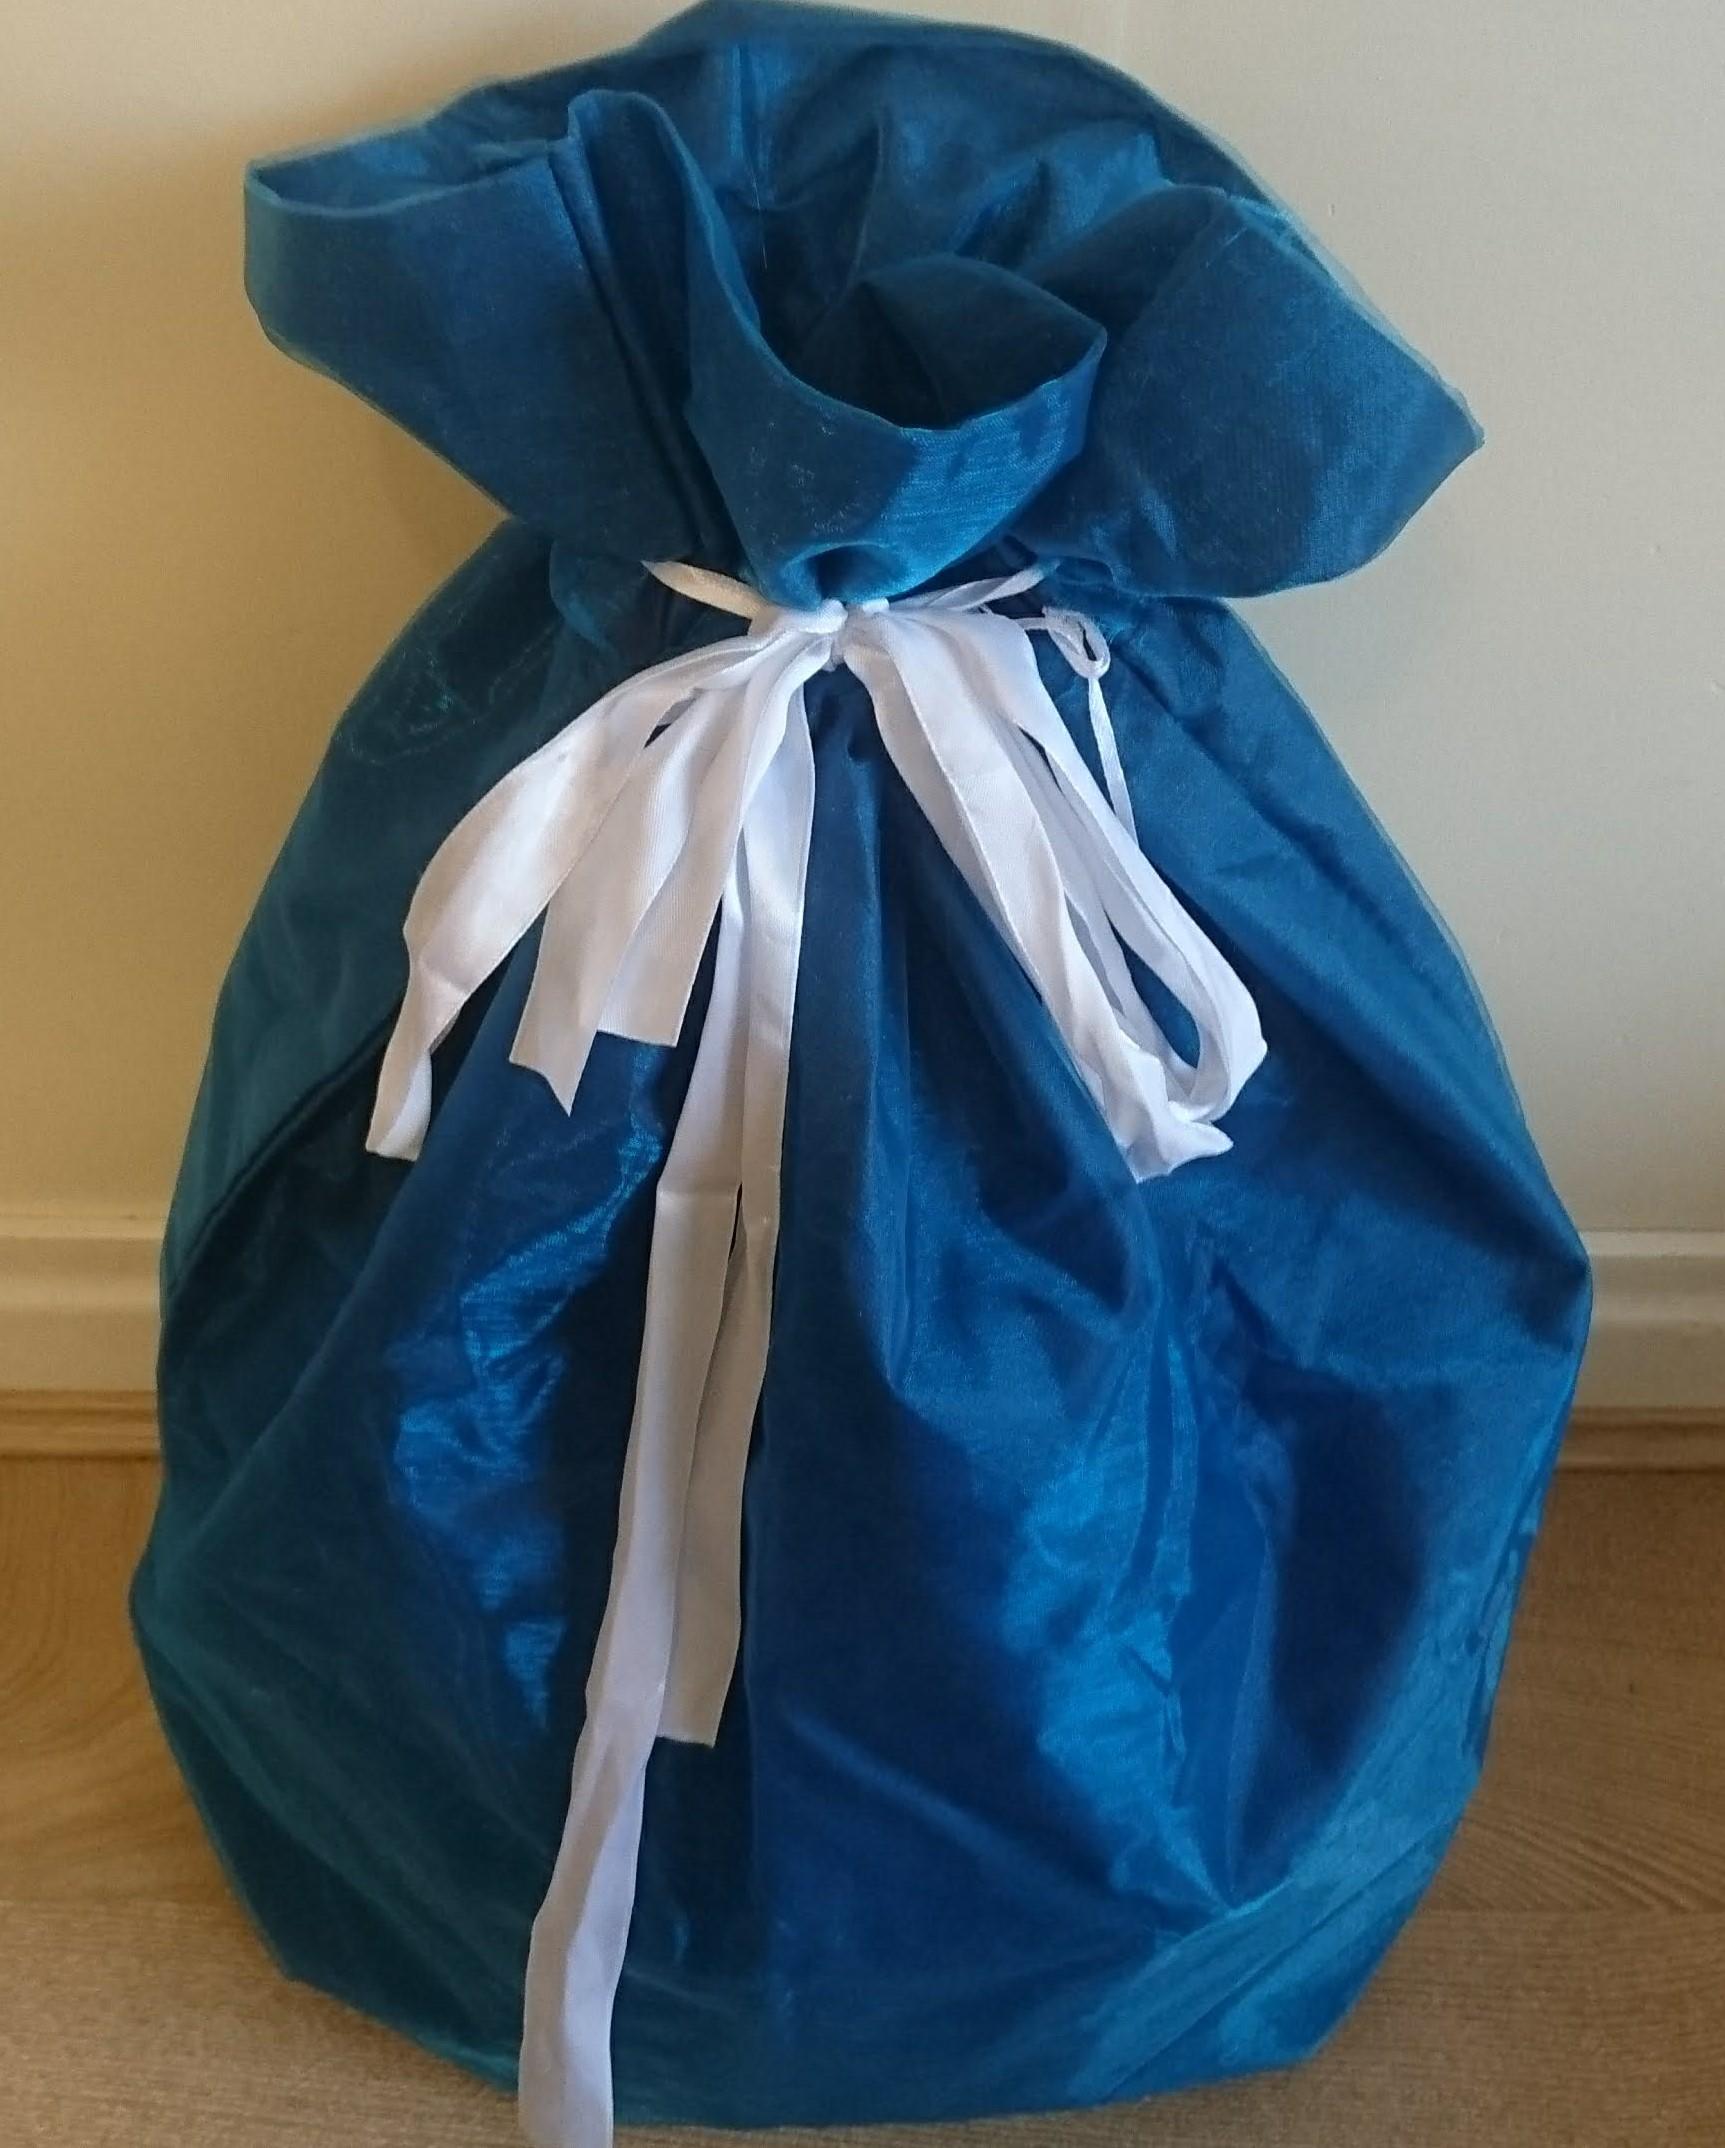 Secret Santa gifts, alternatives to wrapping Secret Santa gifts